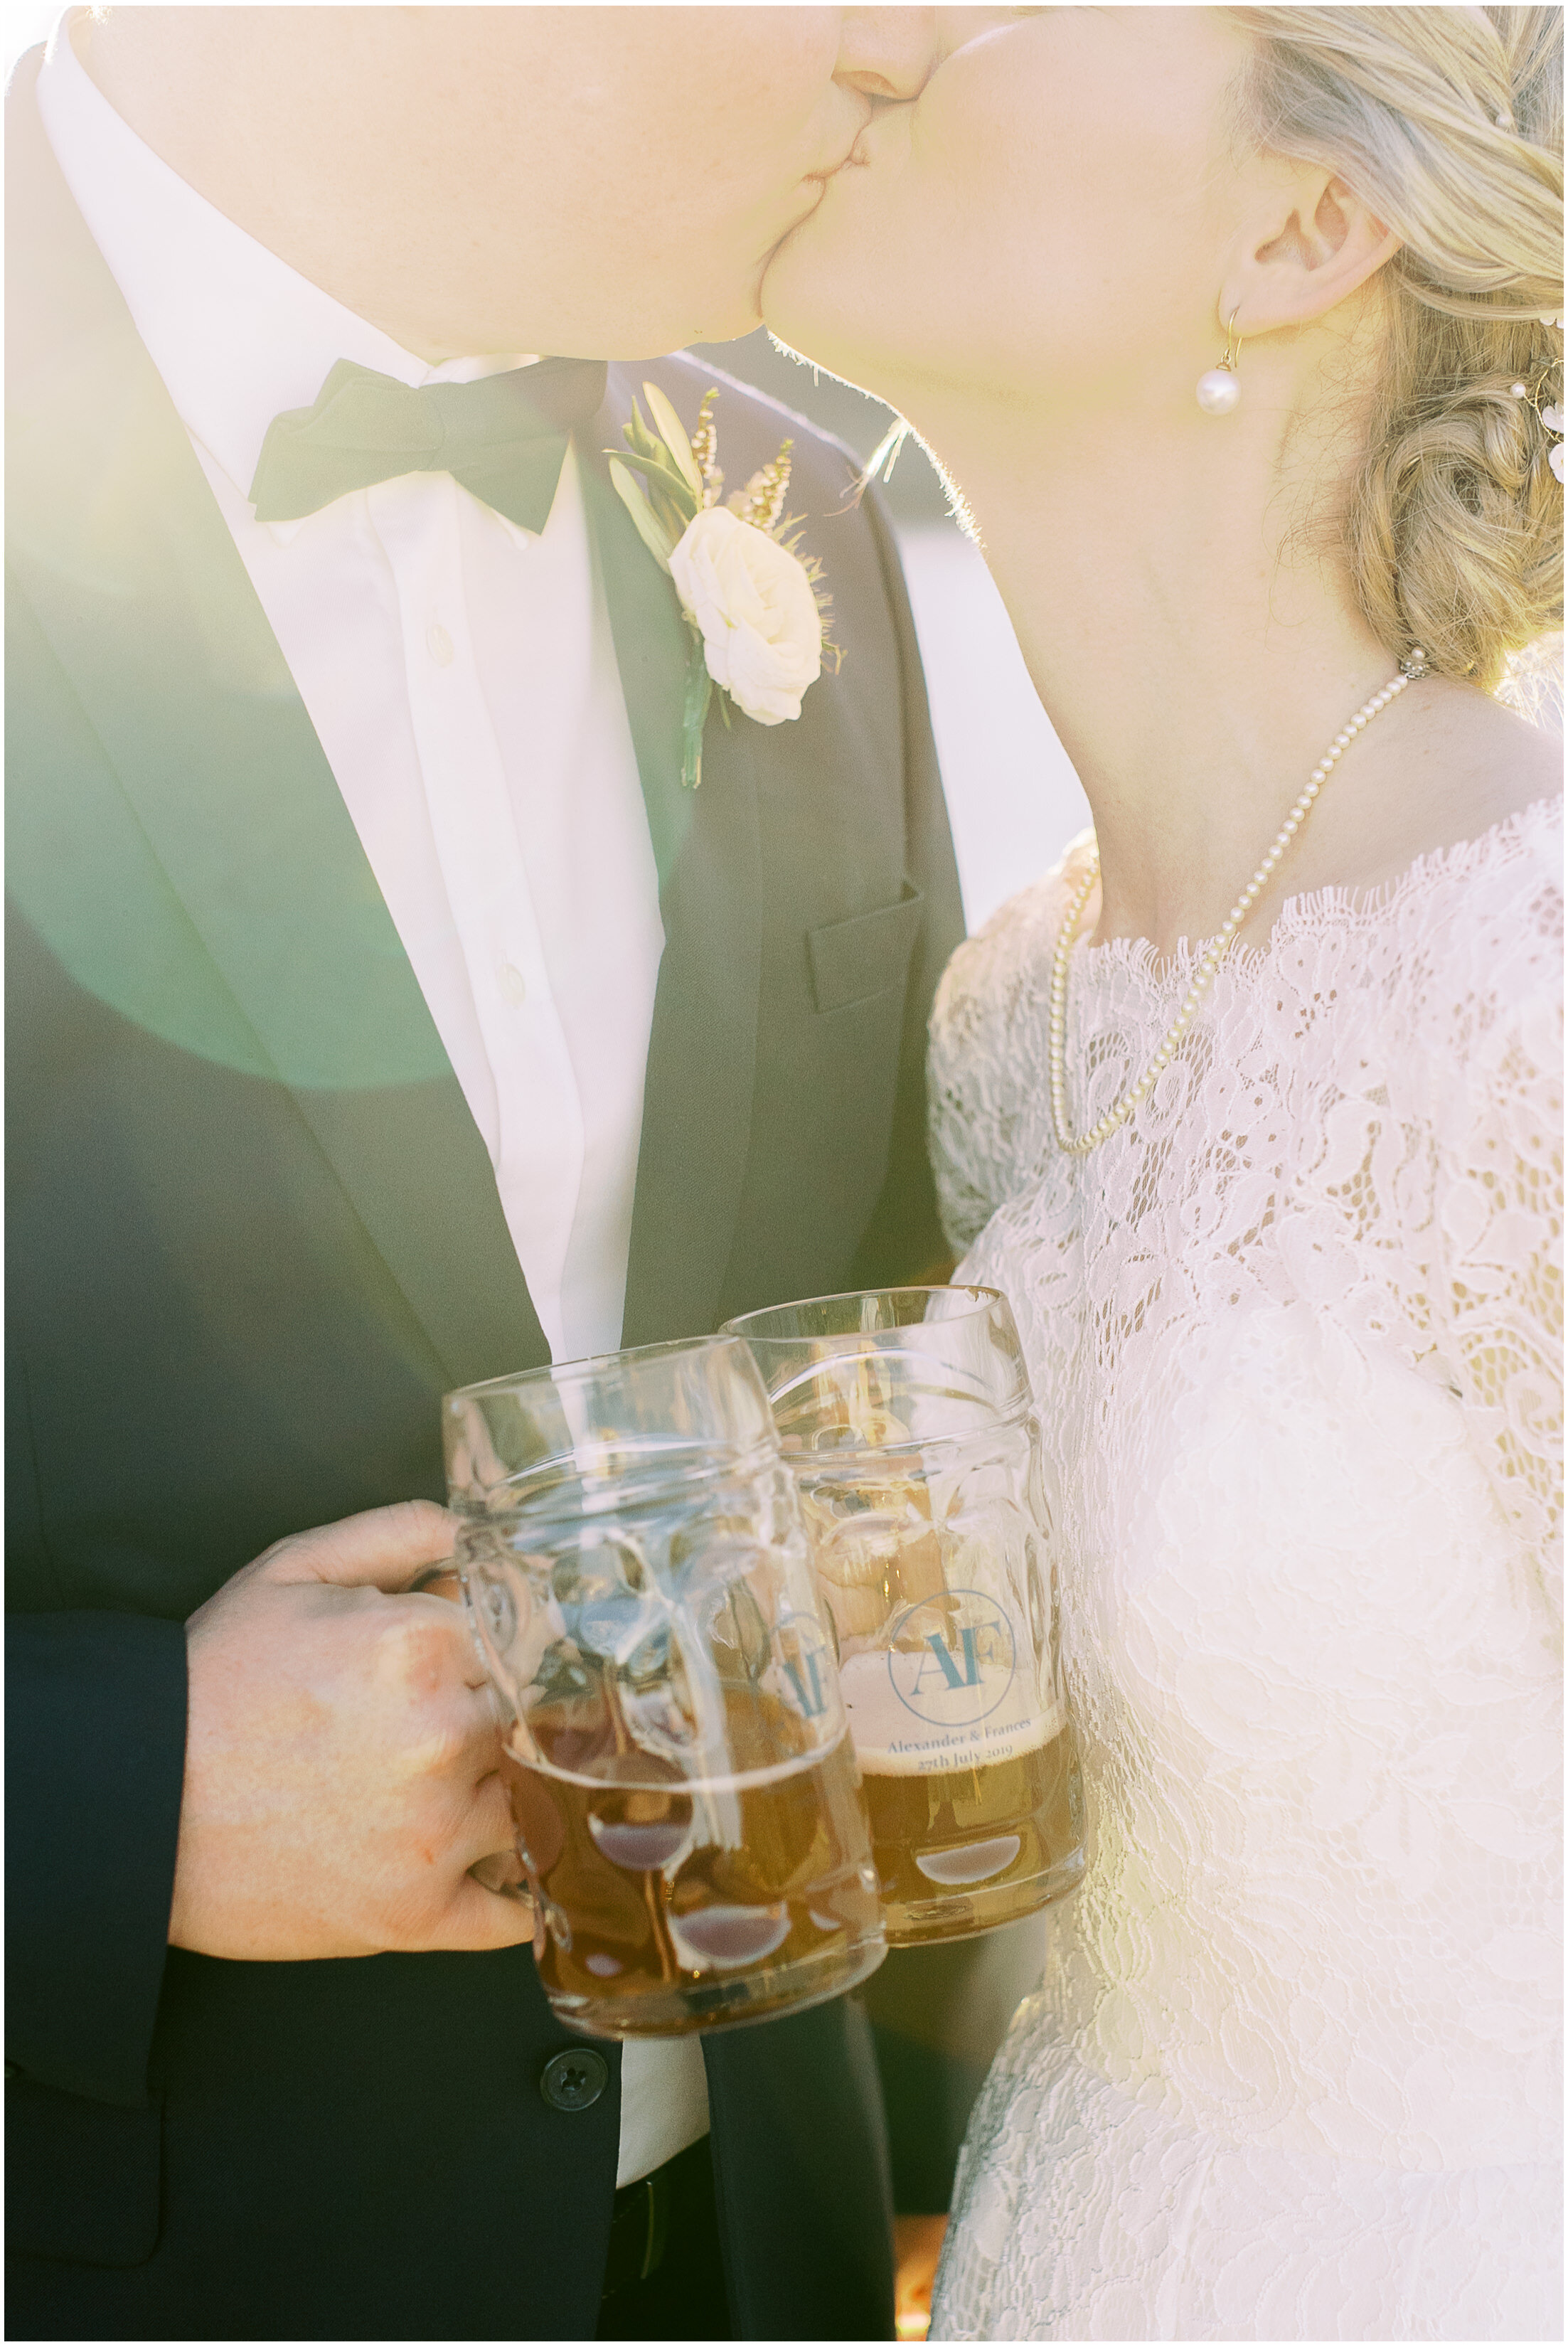 brisbane-fine-art-wedding-photographer-lauren-olivia-luxury-wedding-australia-28.jpg